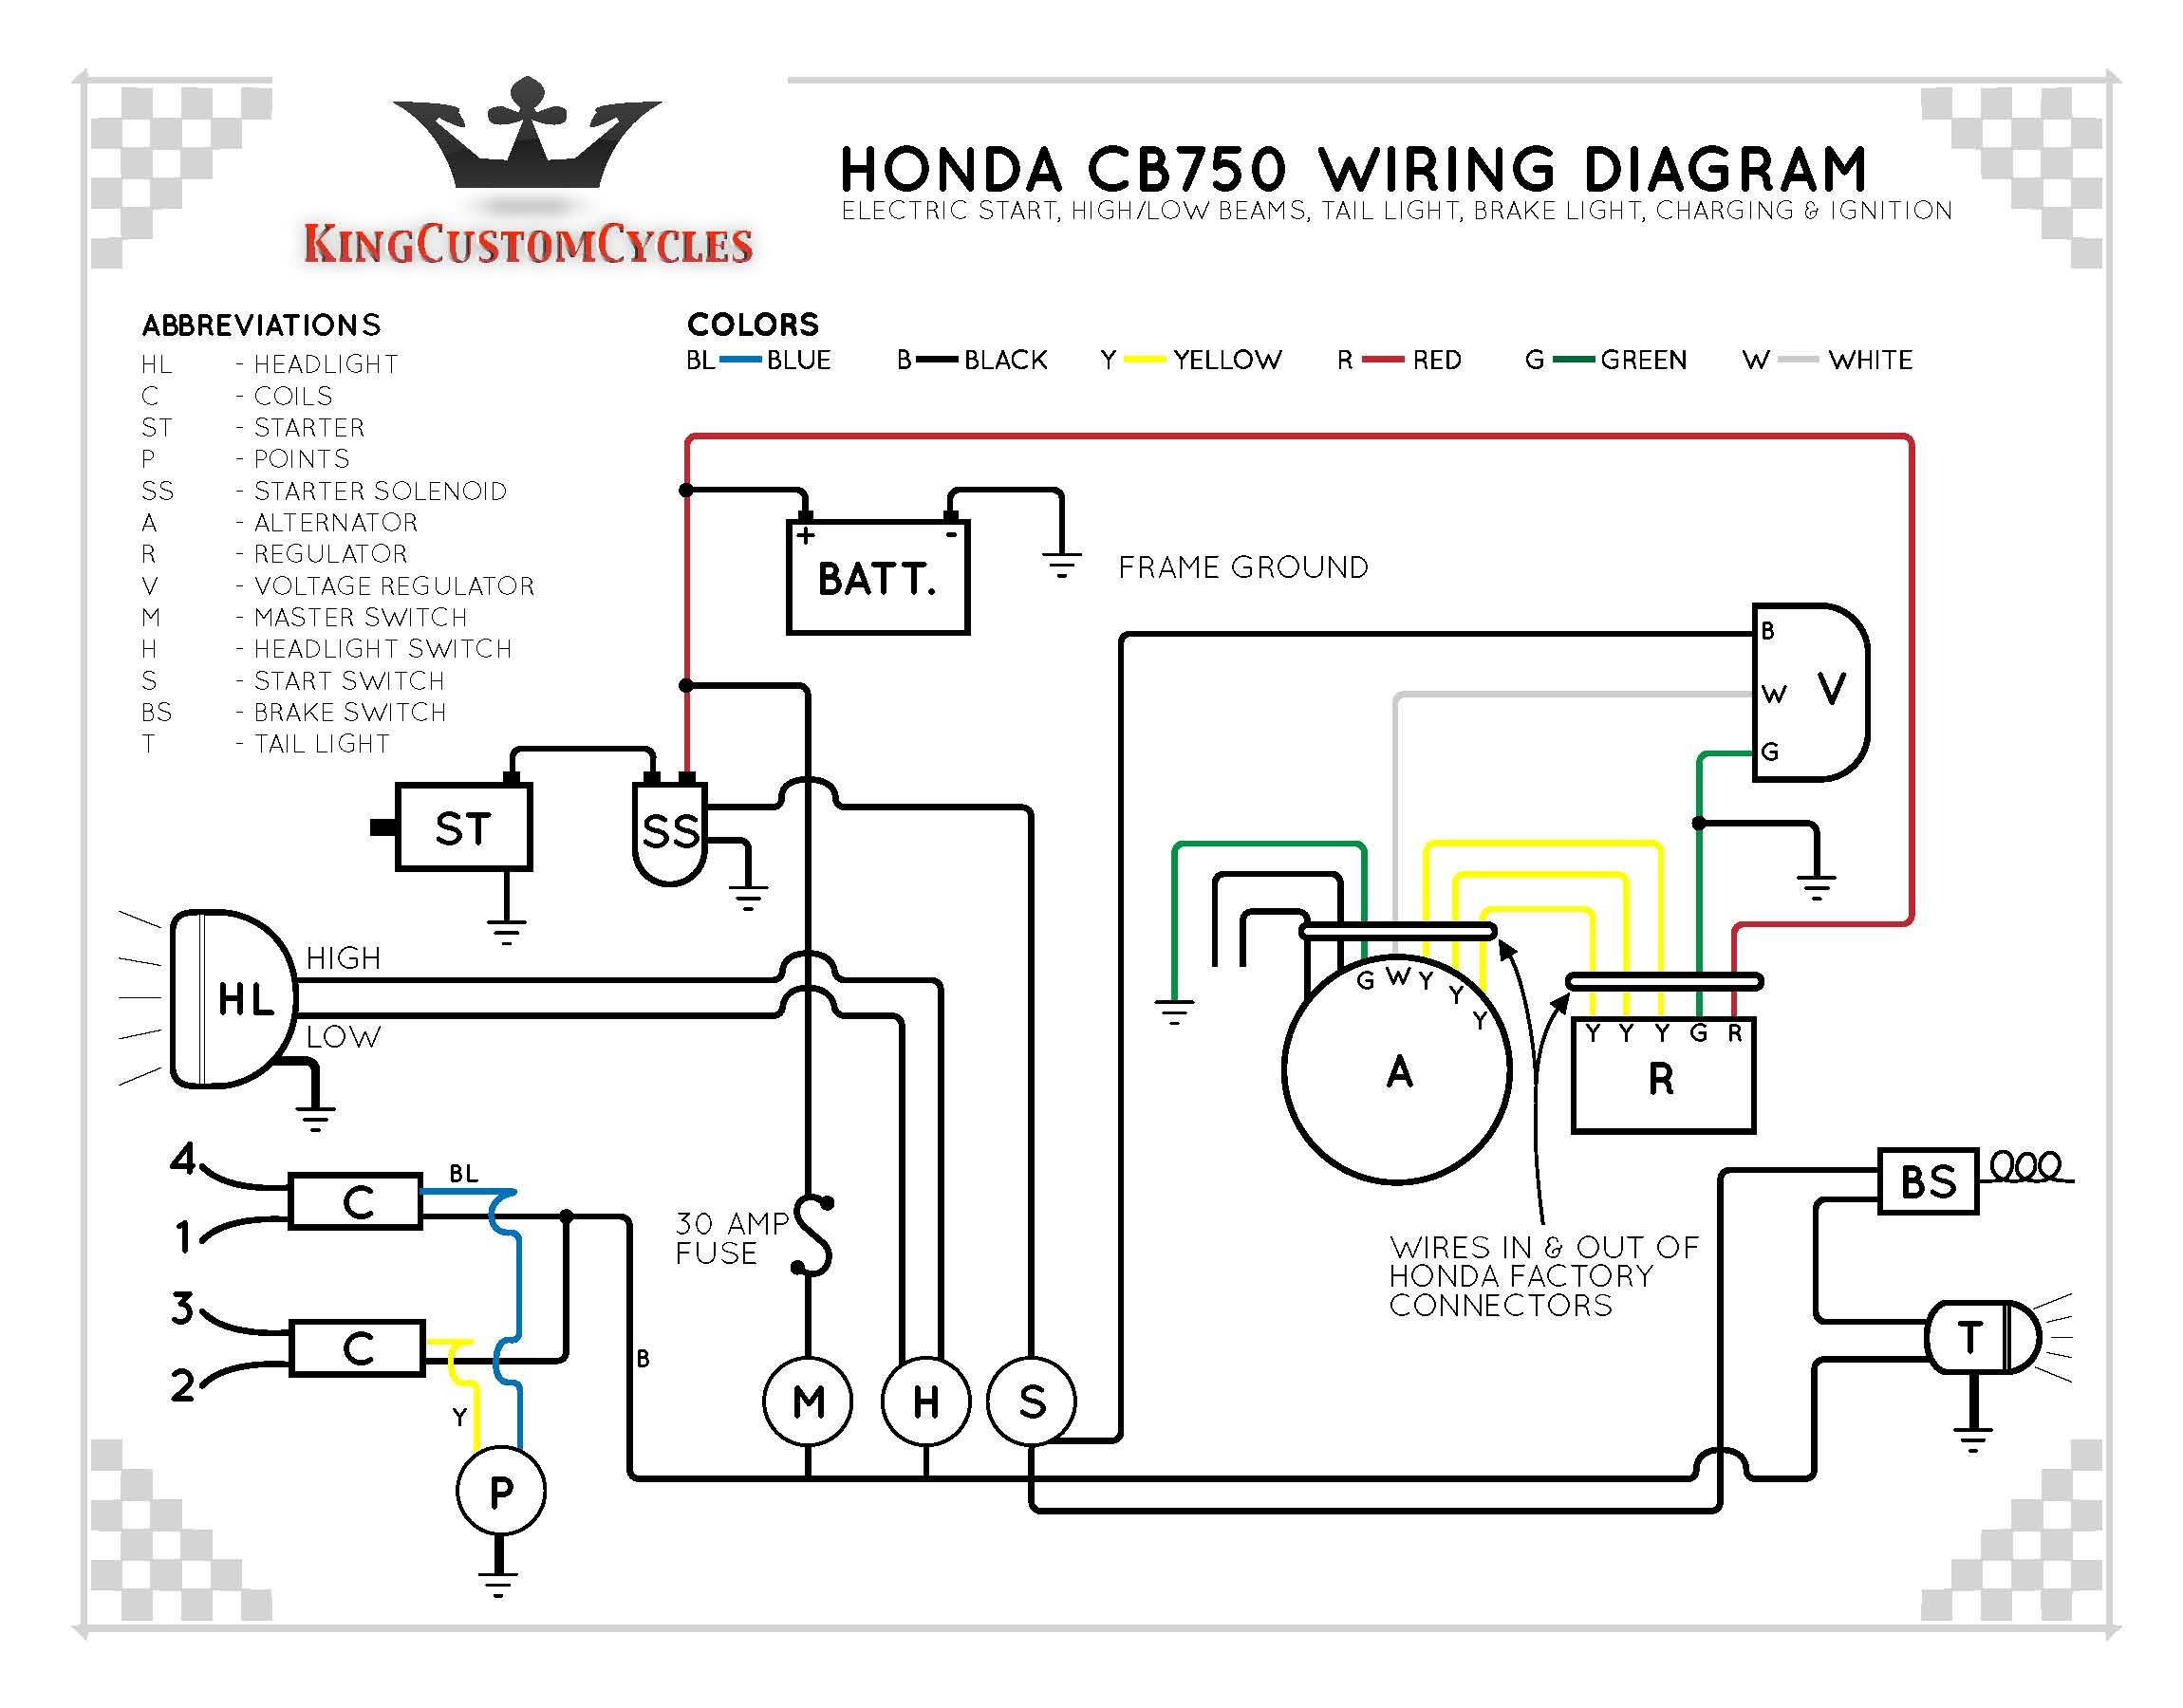 Nighthawk 250 Wiring Diagram Electrical Diagrams 2008 Honda Rebel Alternator 94